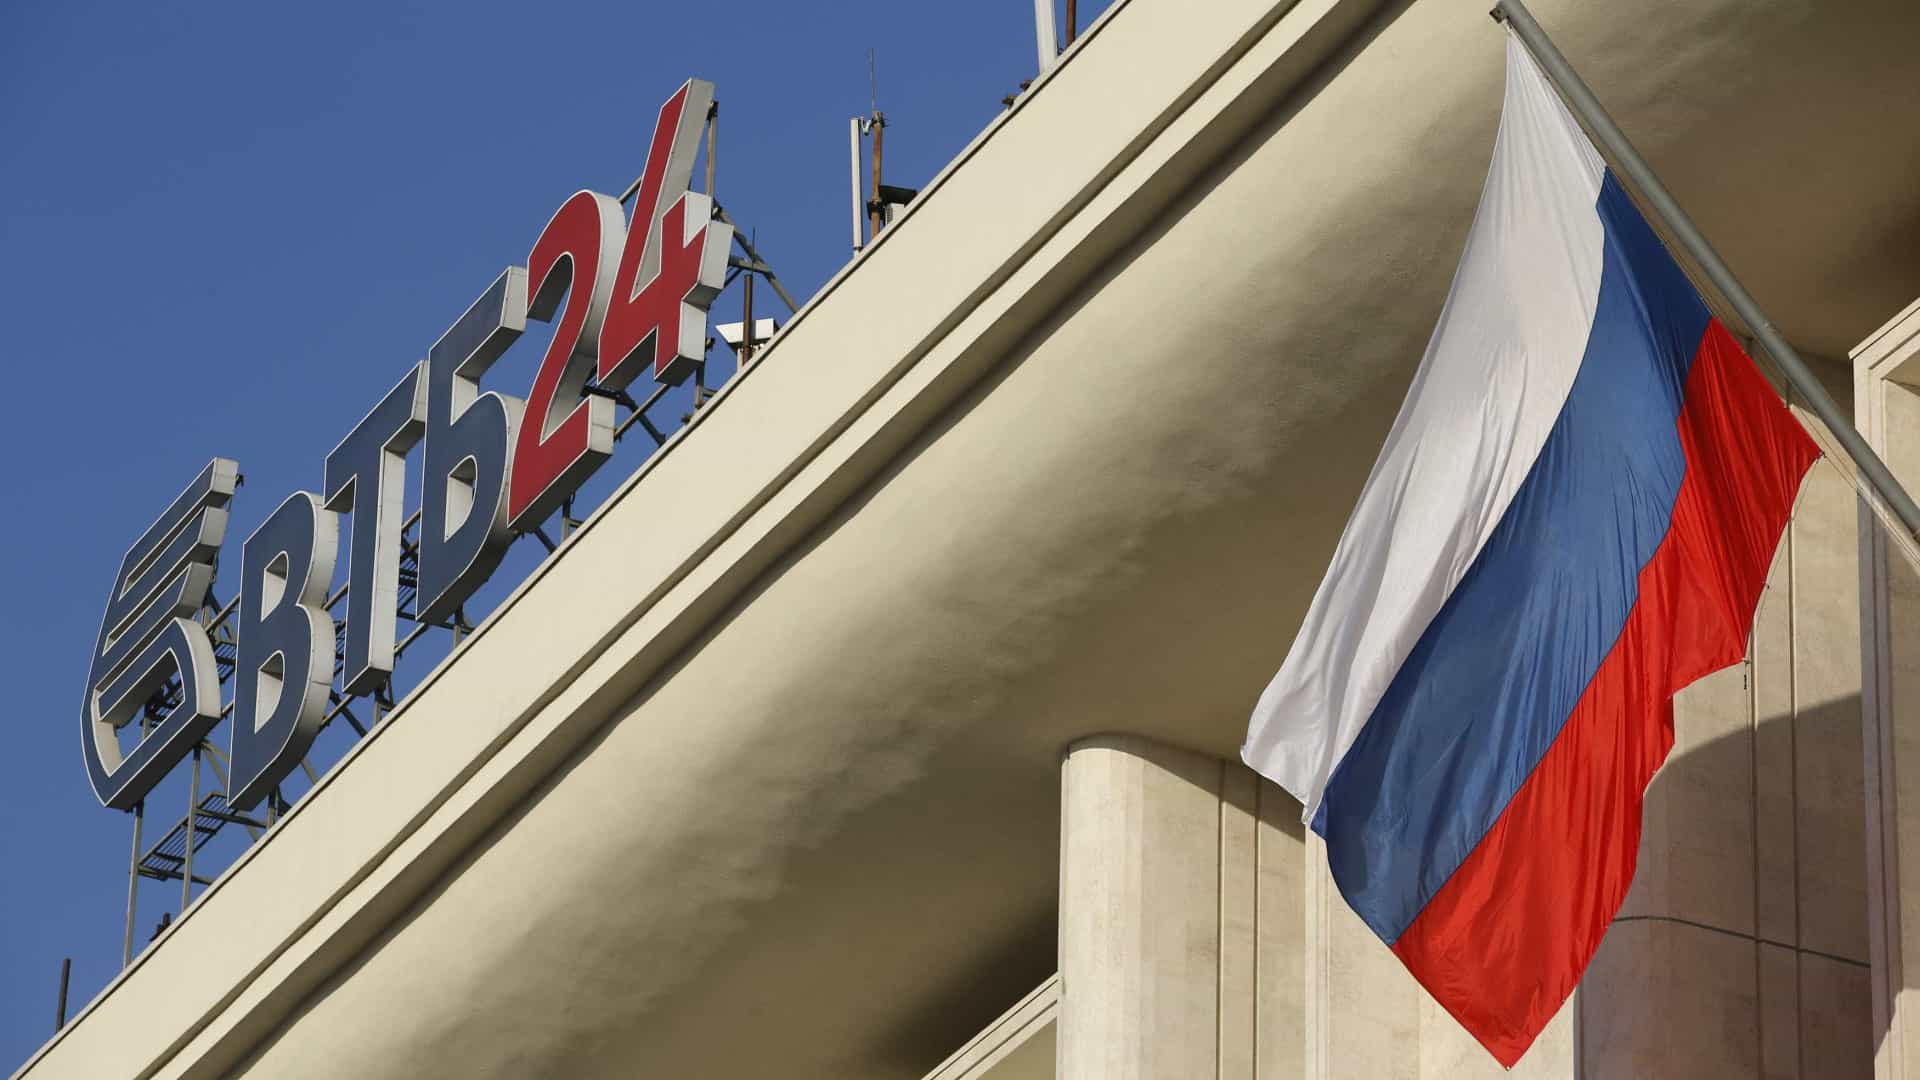 Rússia já começou a expulsar diplomatas europeus